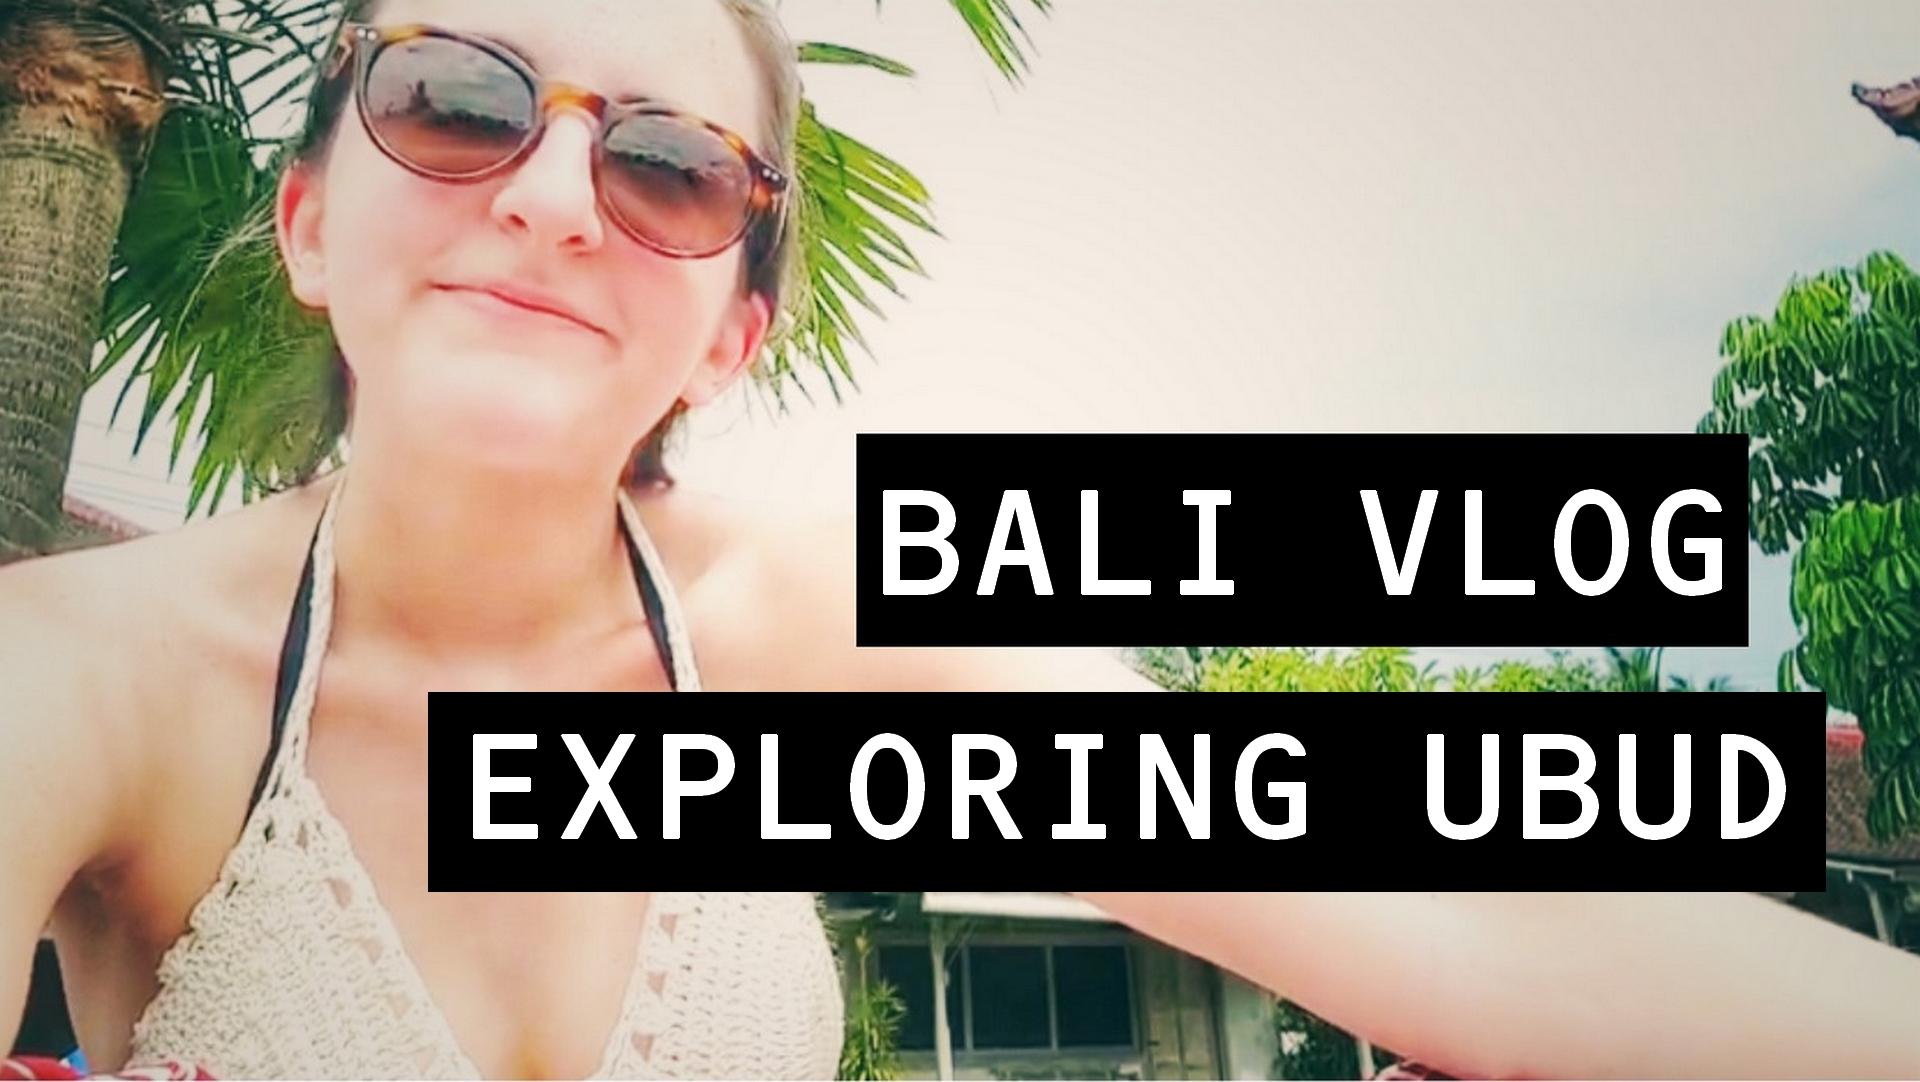 Bali Vlog (Part 1): Exploring Ubud!